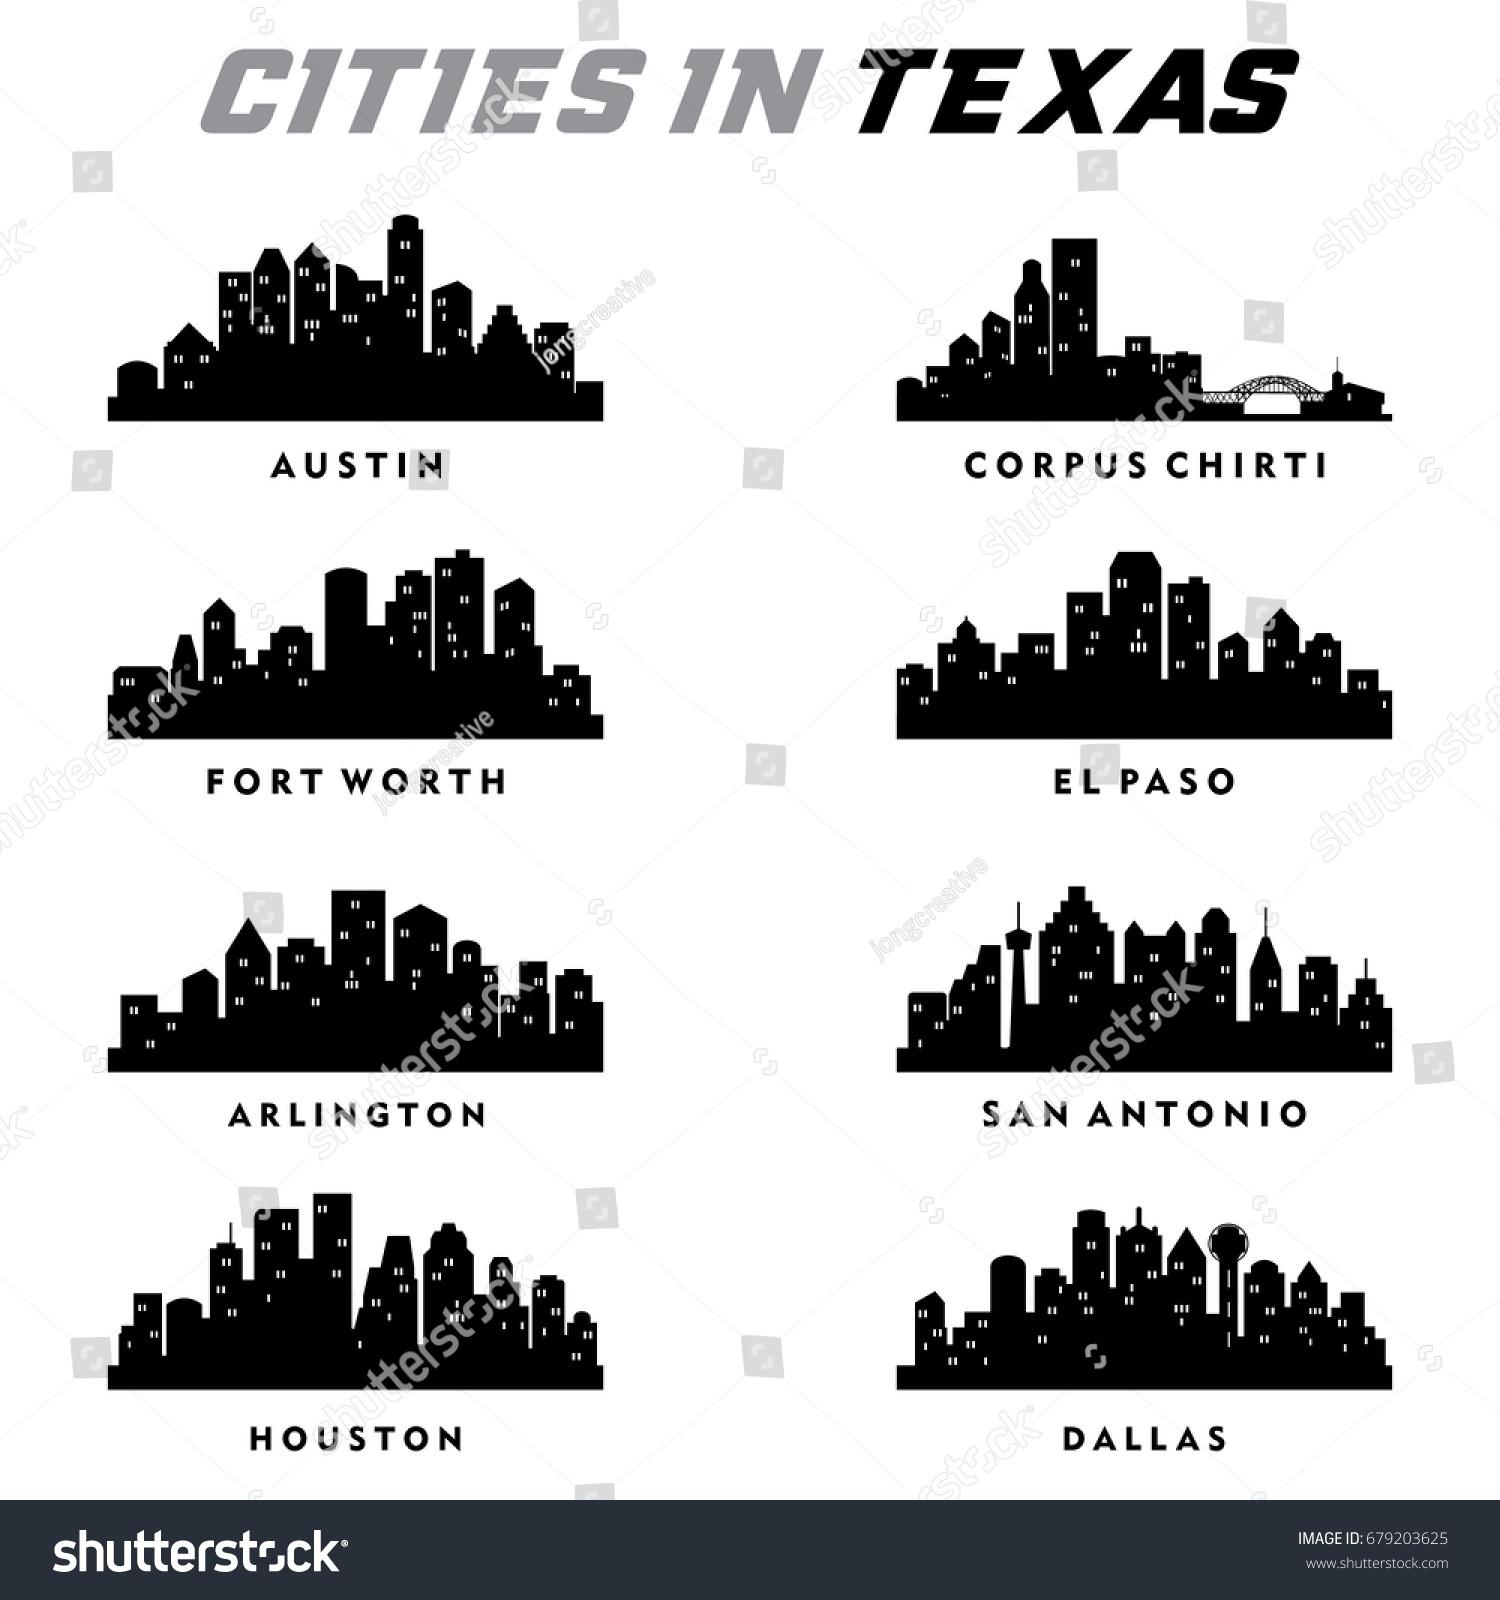 texas cities silhouette city skyline cityscape